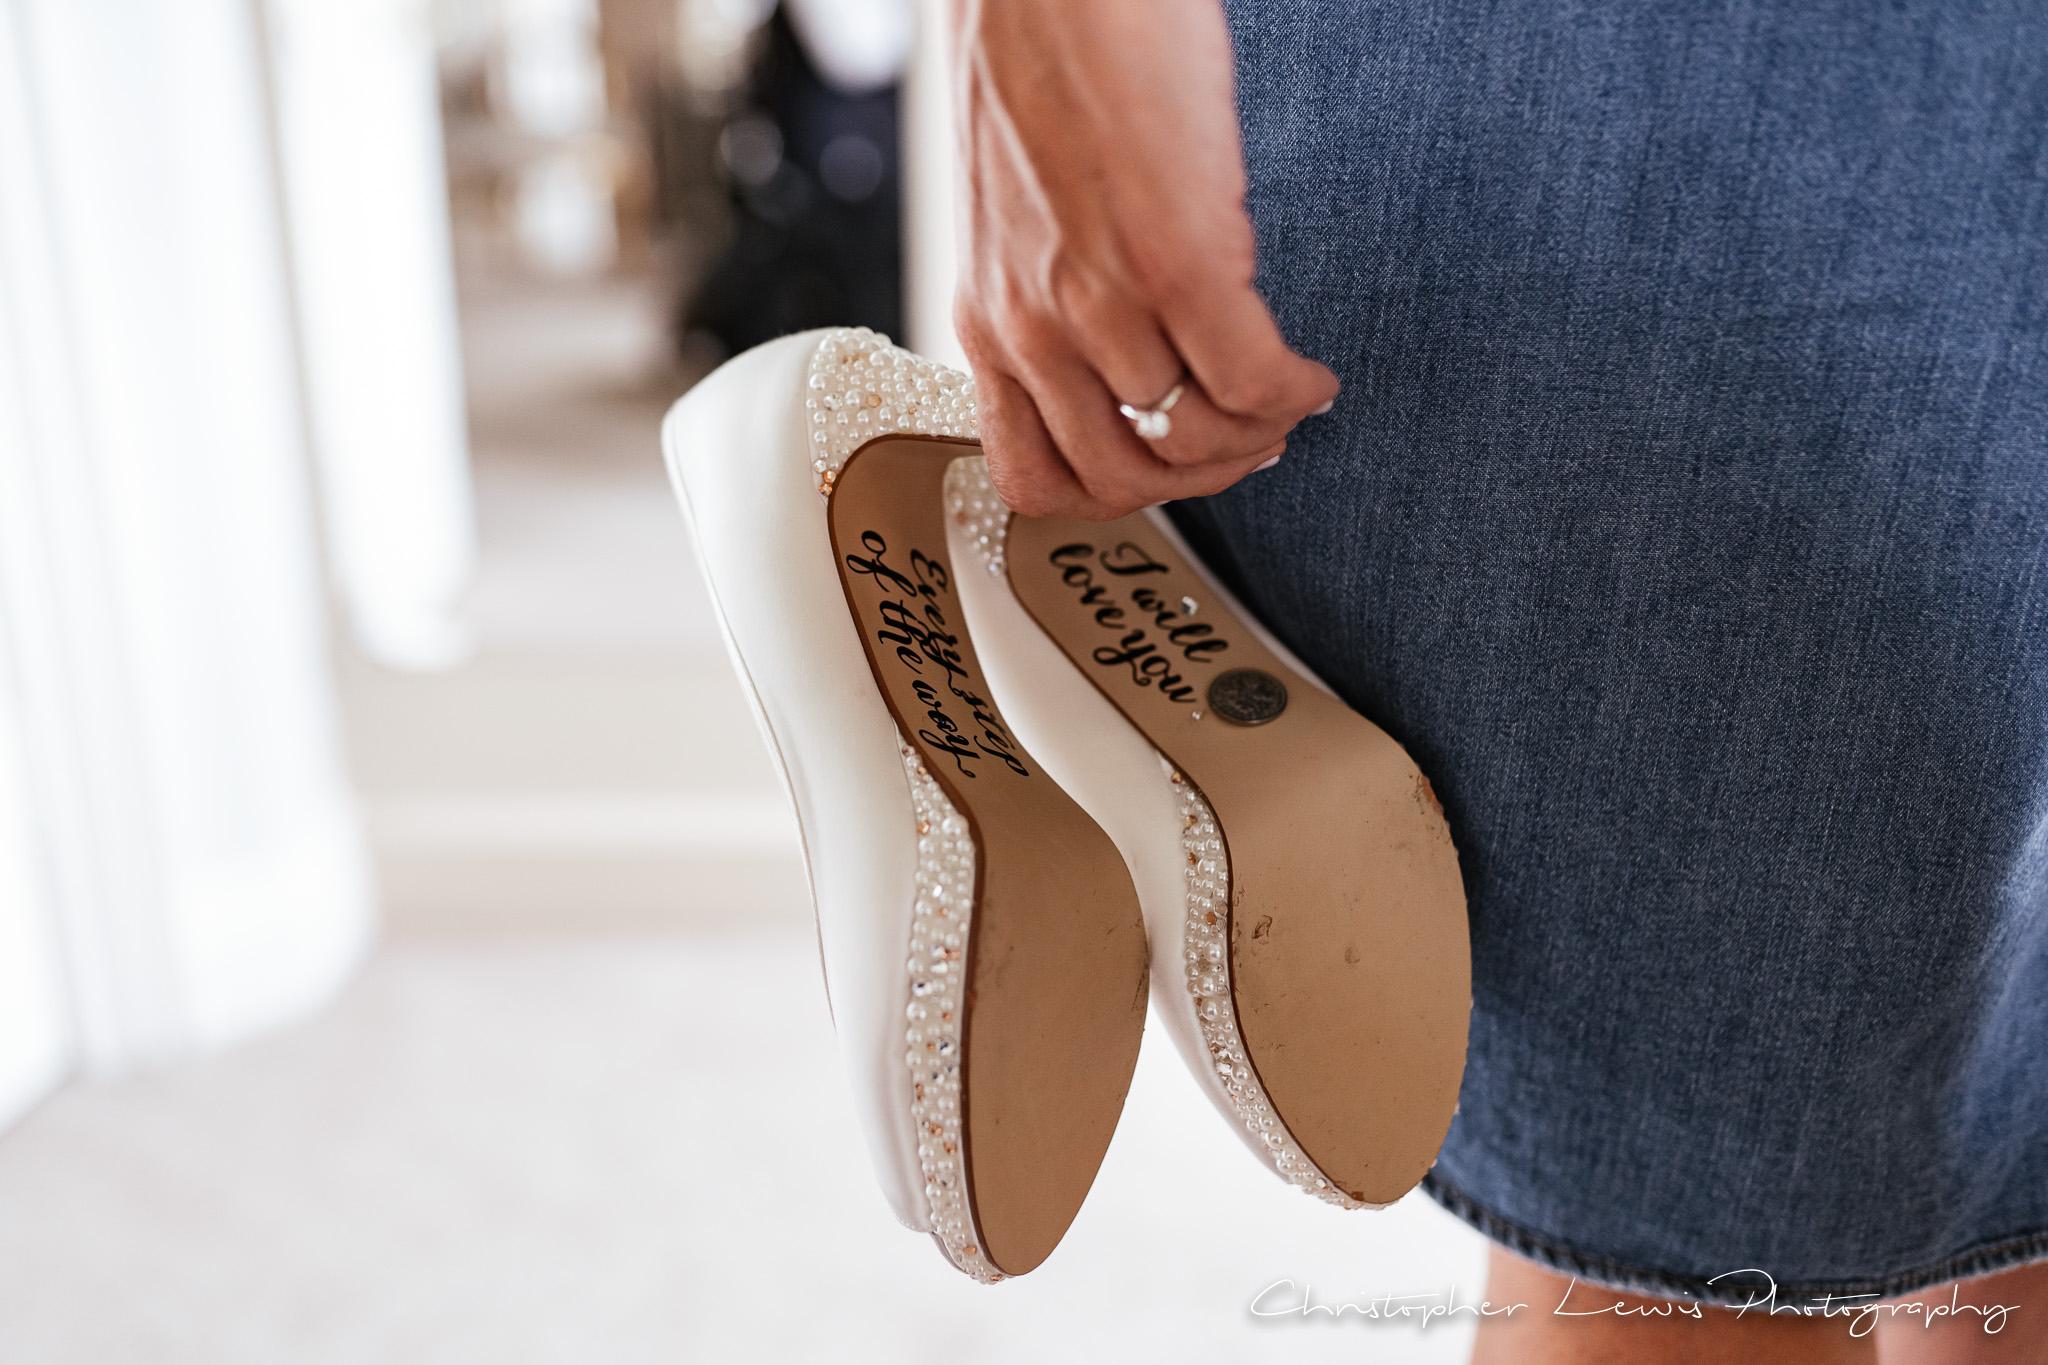 Colshaw Hall Wedding shoes